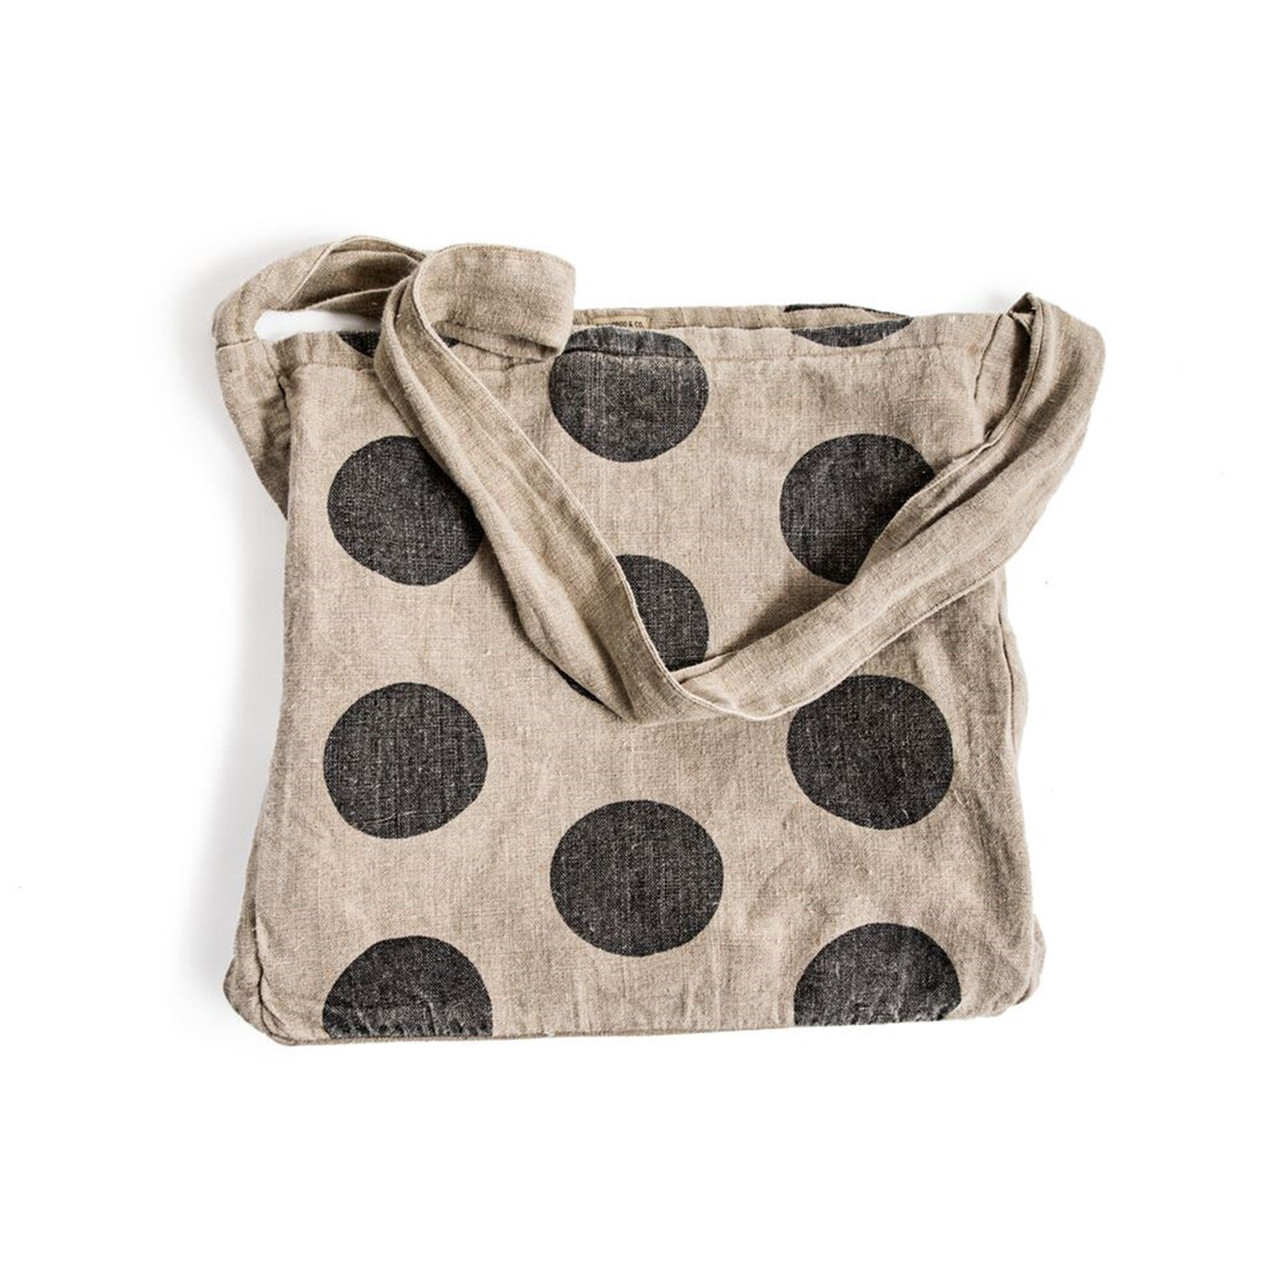 canvas messenger bag with black polka dots